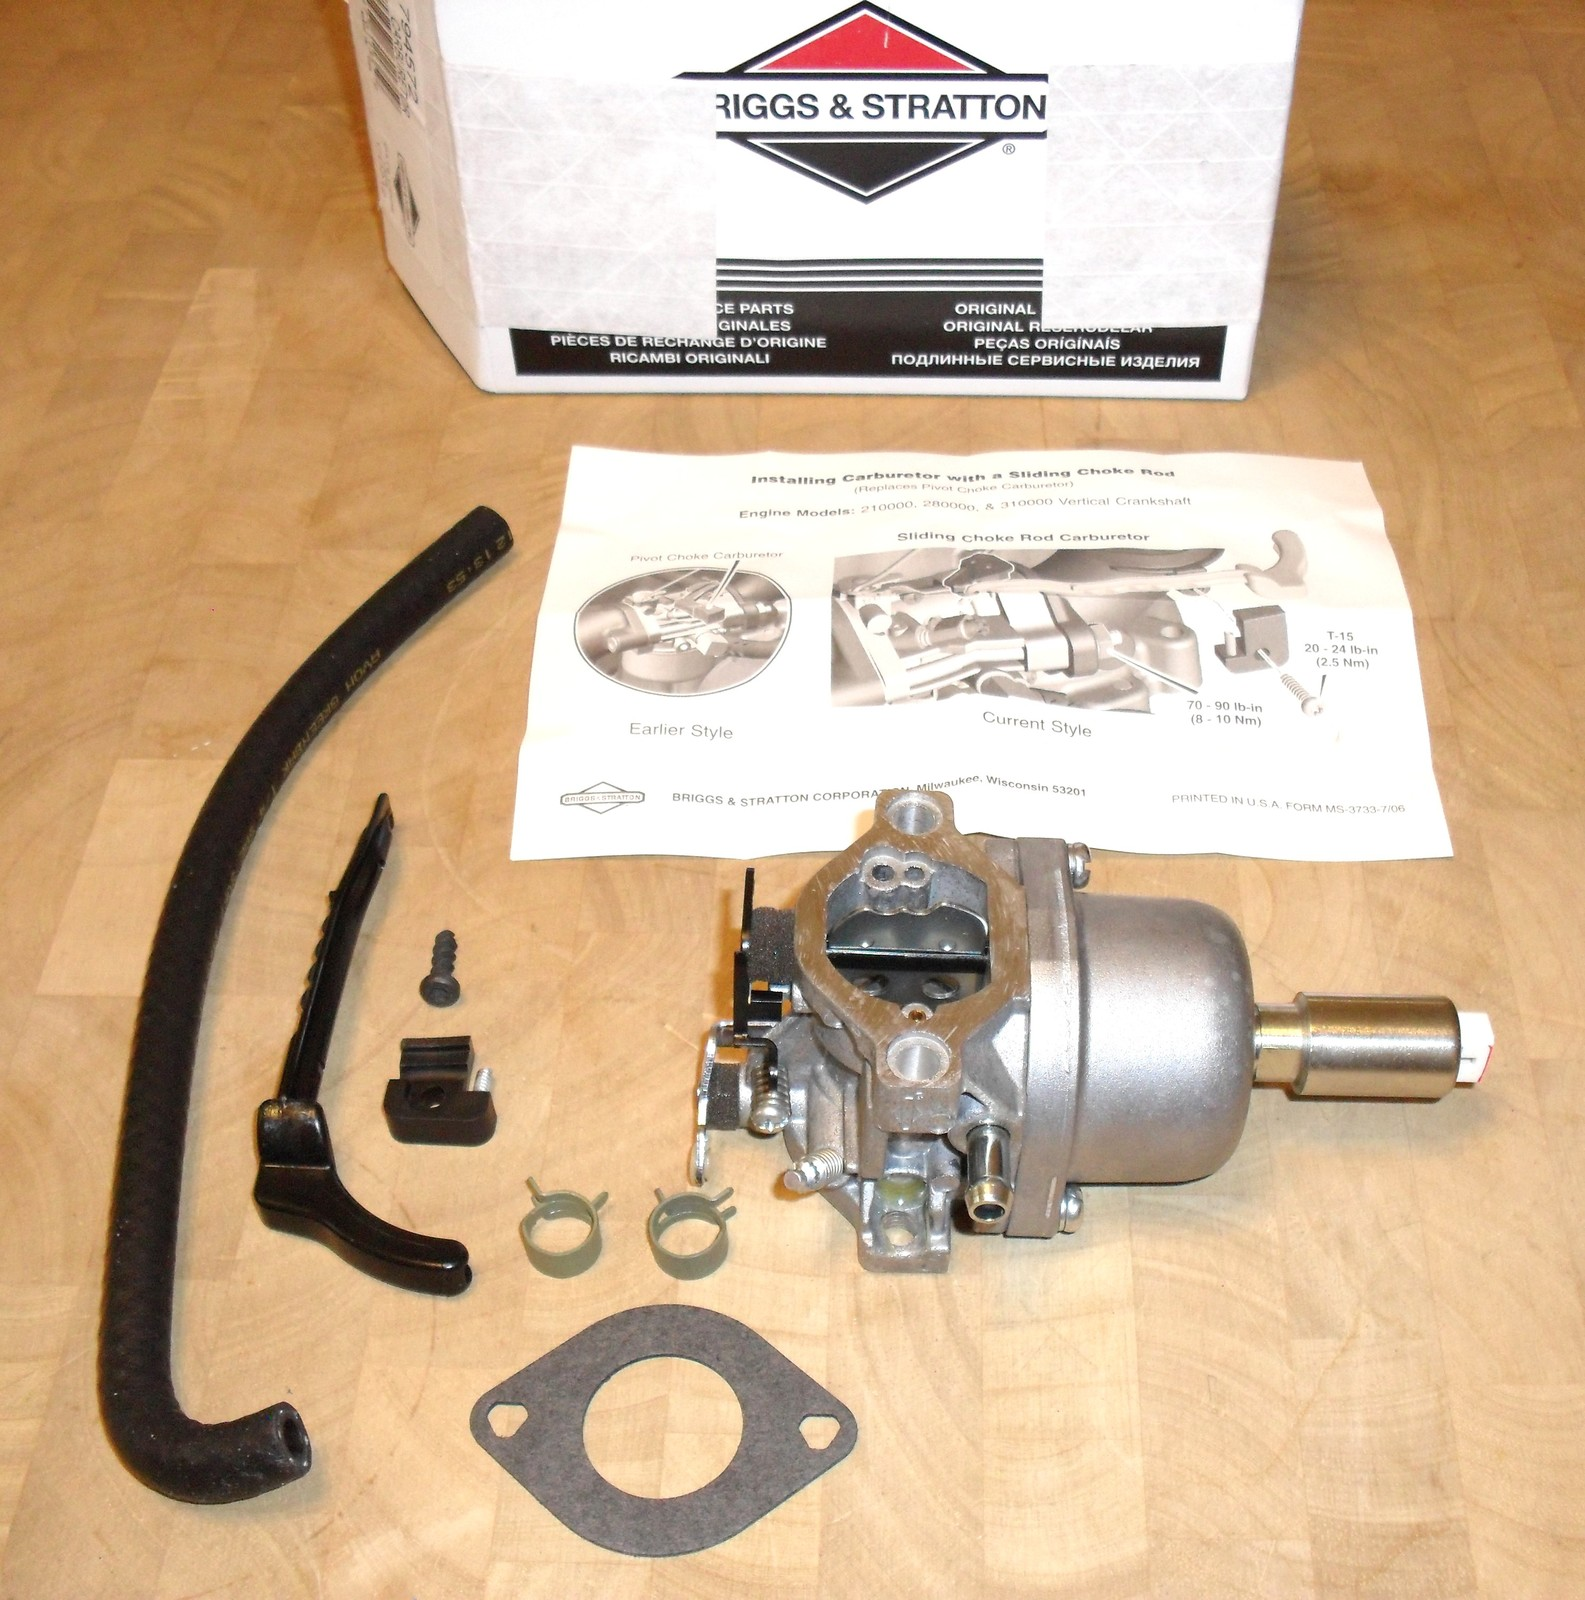 briggs stratton nikki carburetor diagram ibanez wiring 5 way switch and carb 50 similar items